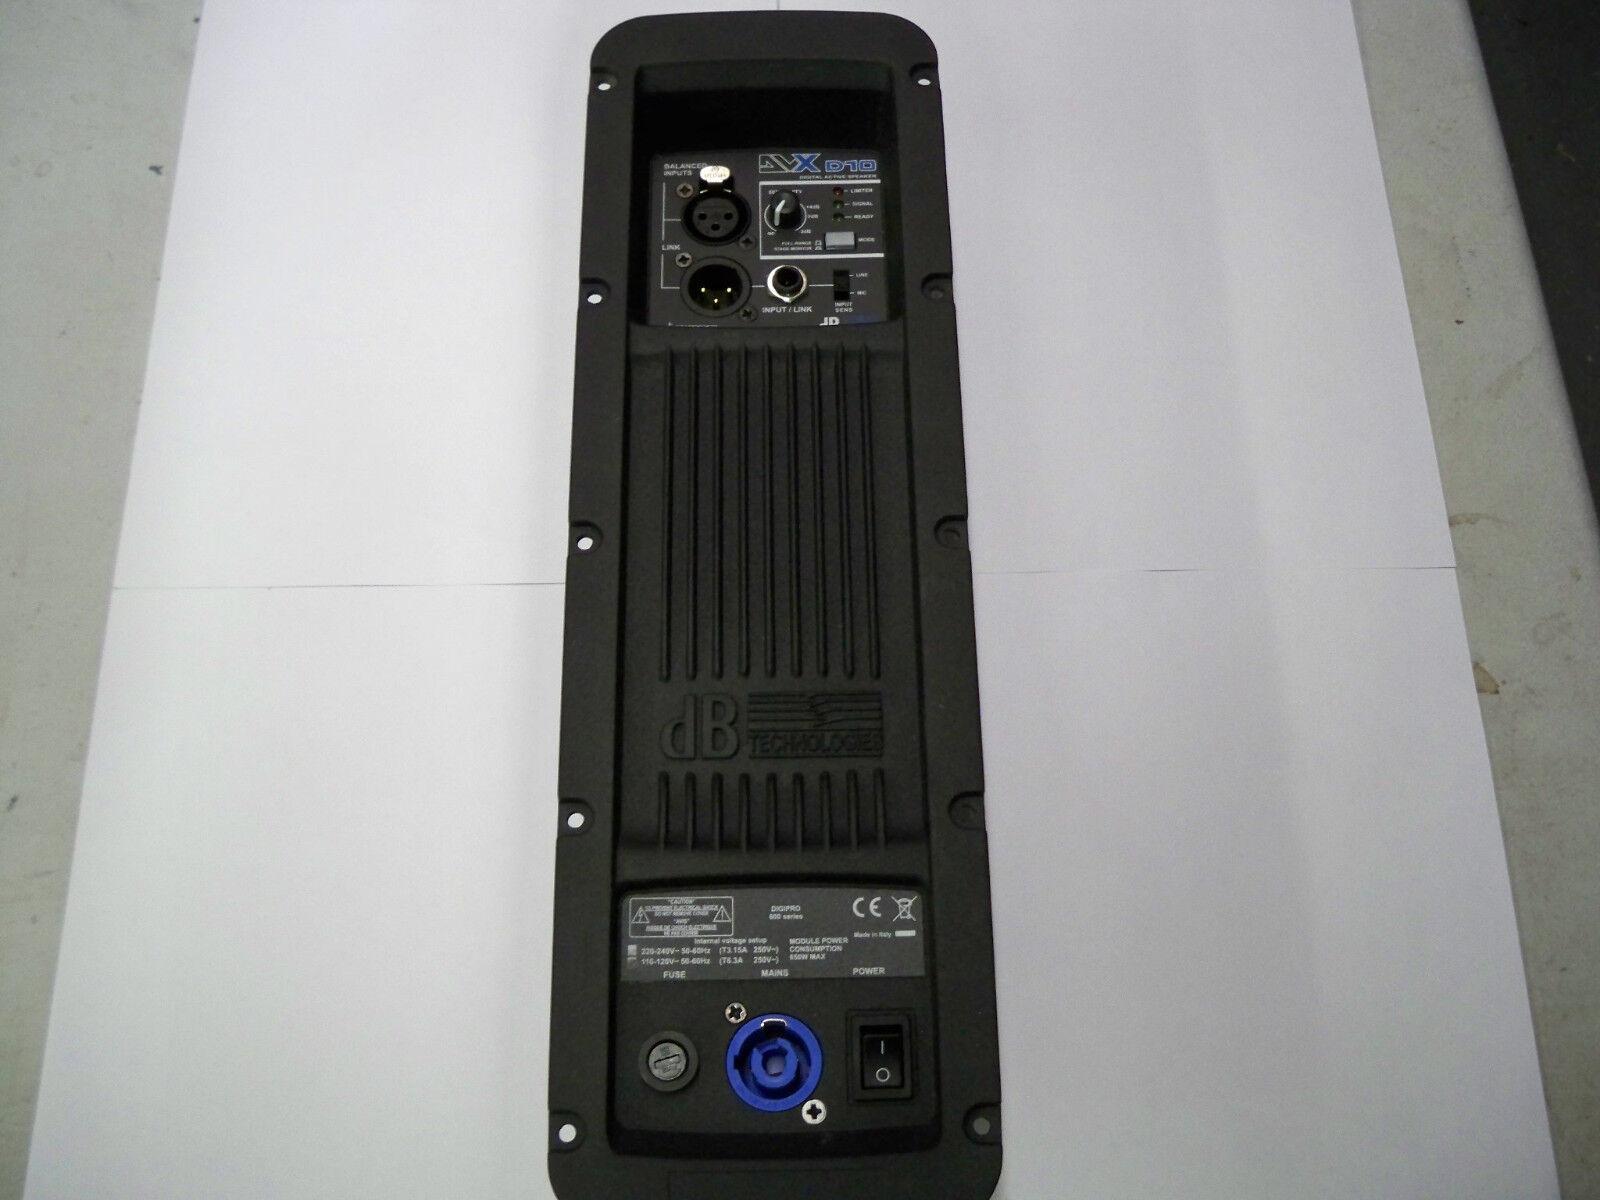 DB Technologies DVX10 600W Verstärker - Brand Neue DB-Technologien-